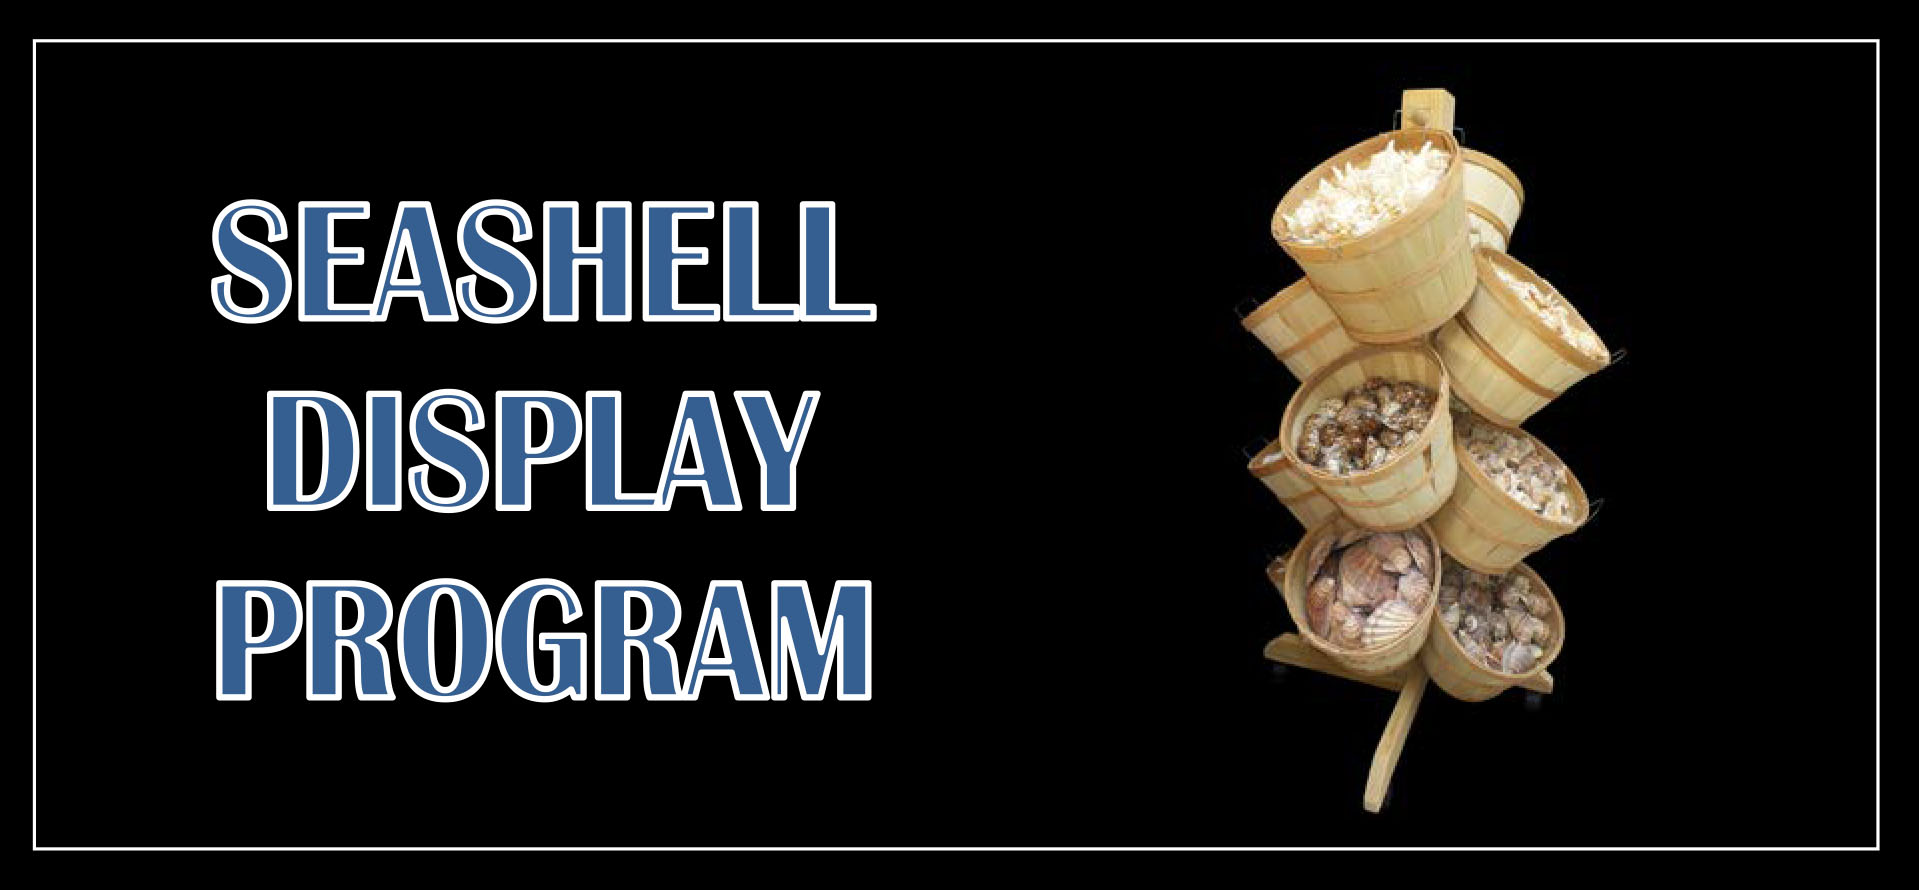 seashell-display-program.jpg